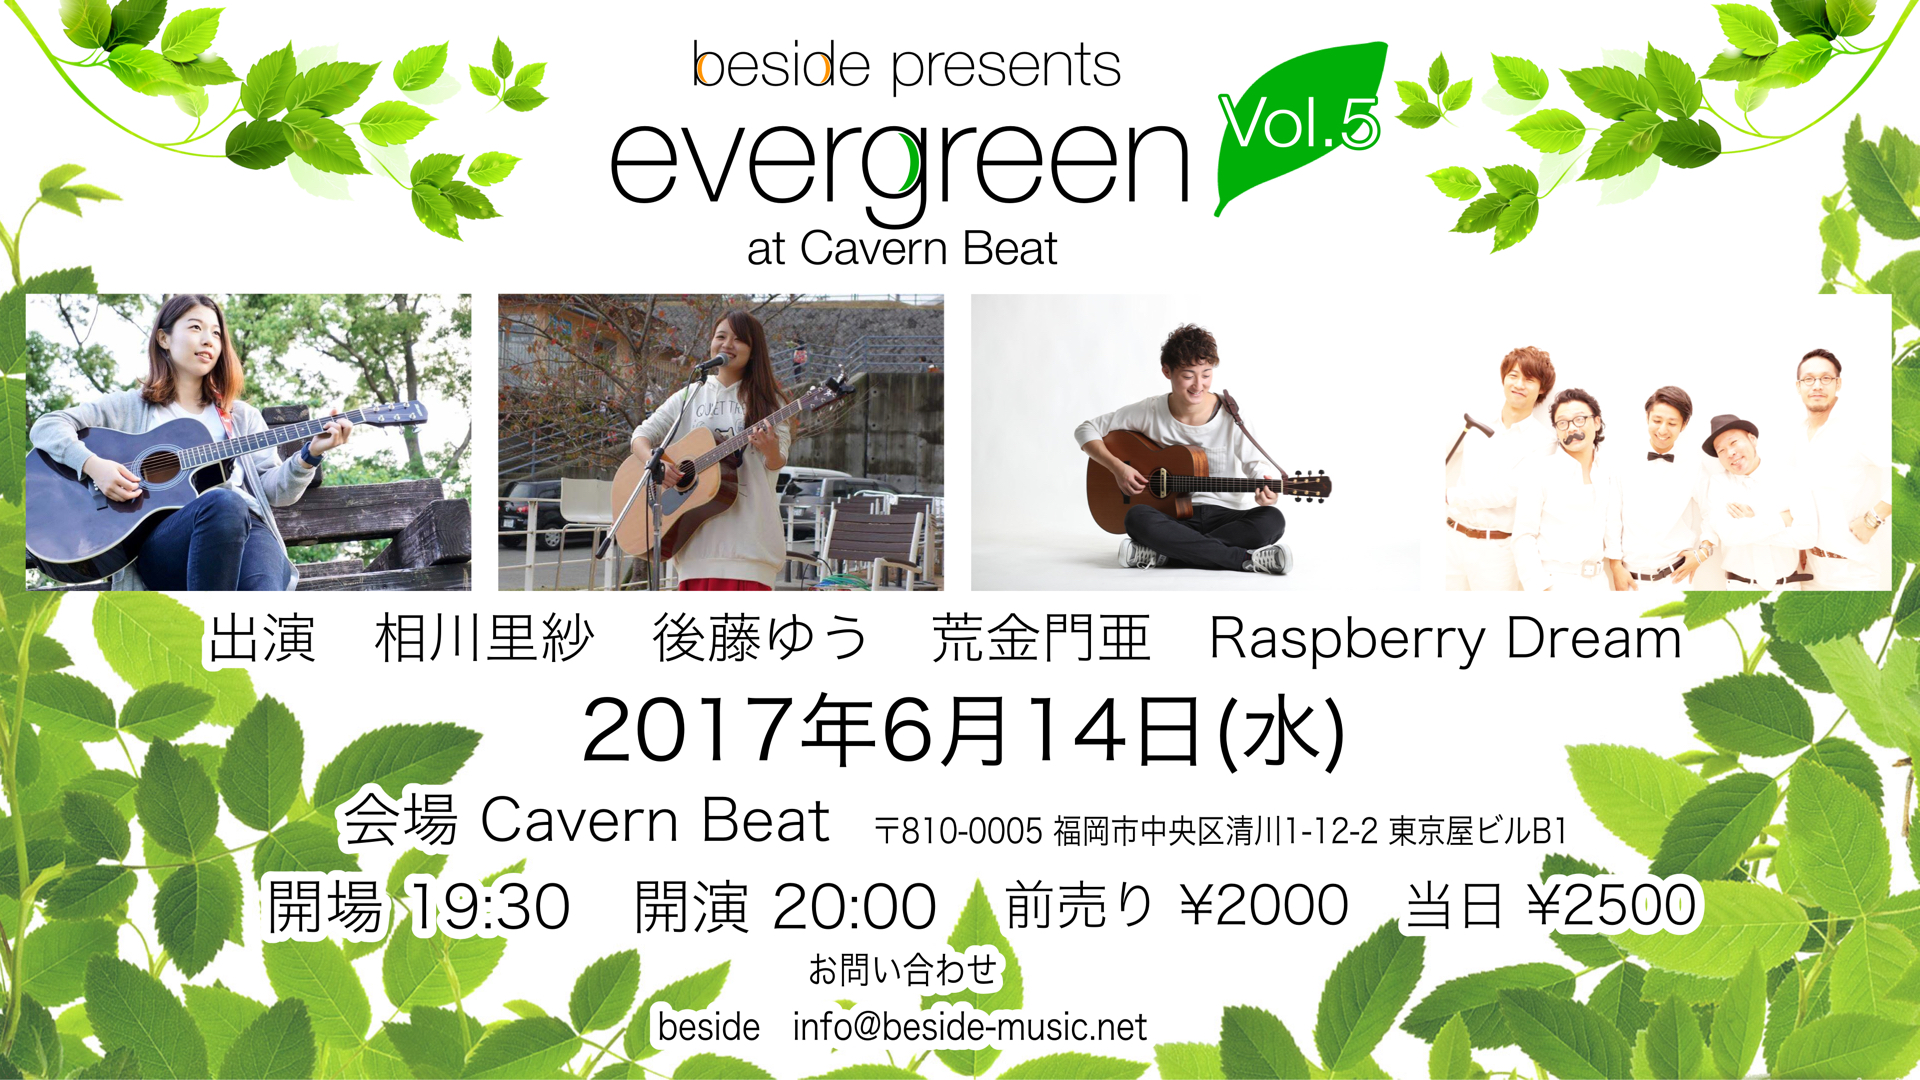 "2017.6.14(水) beside presents ""evergreen Vol.5"" @Cavern Beat"